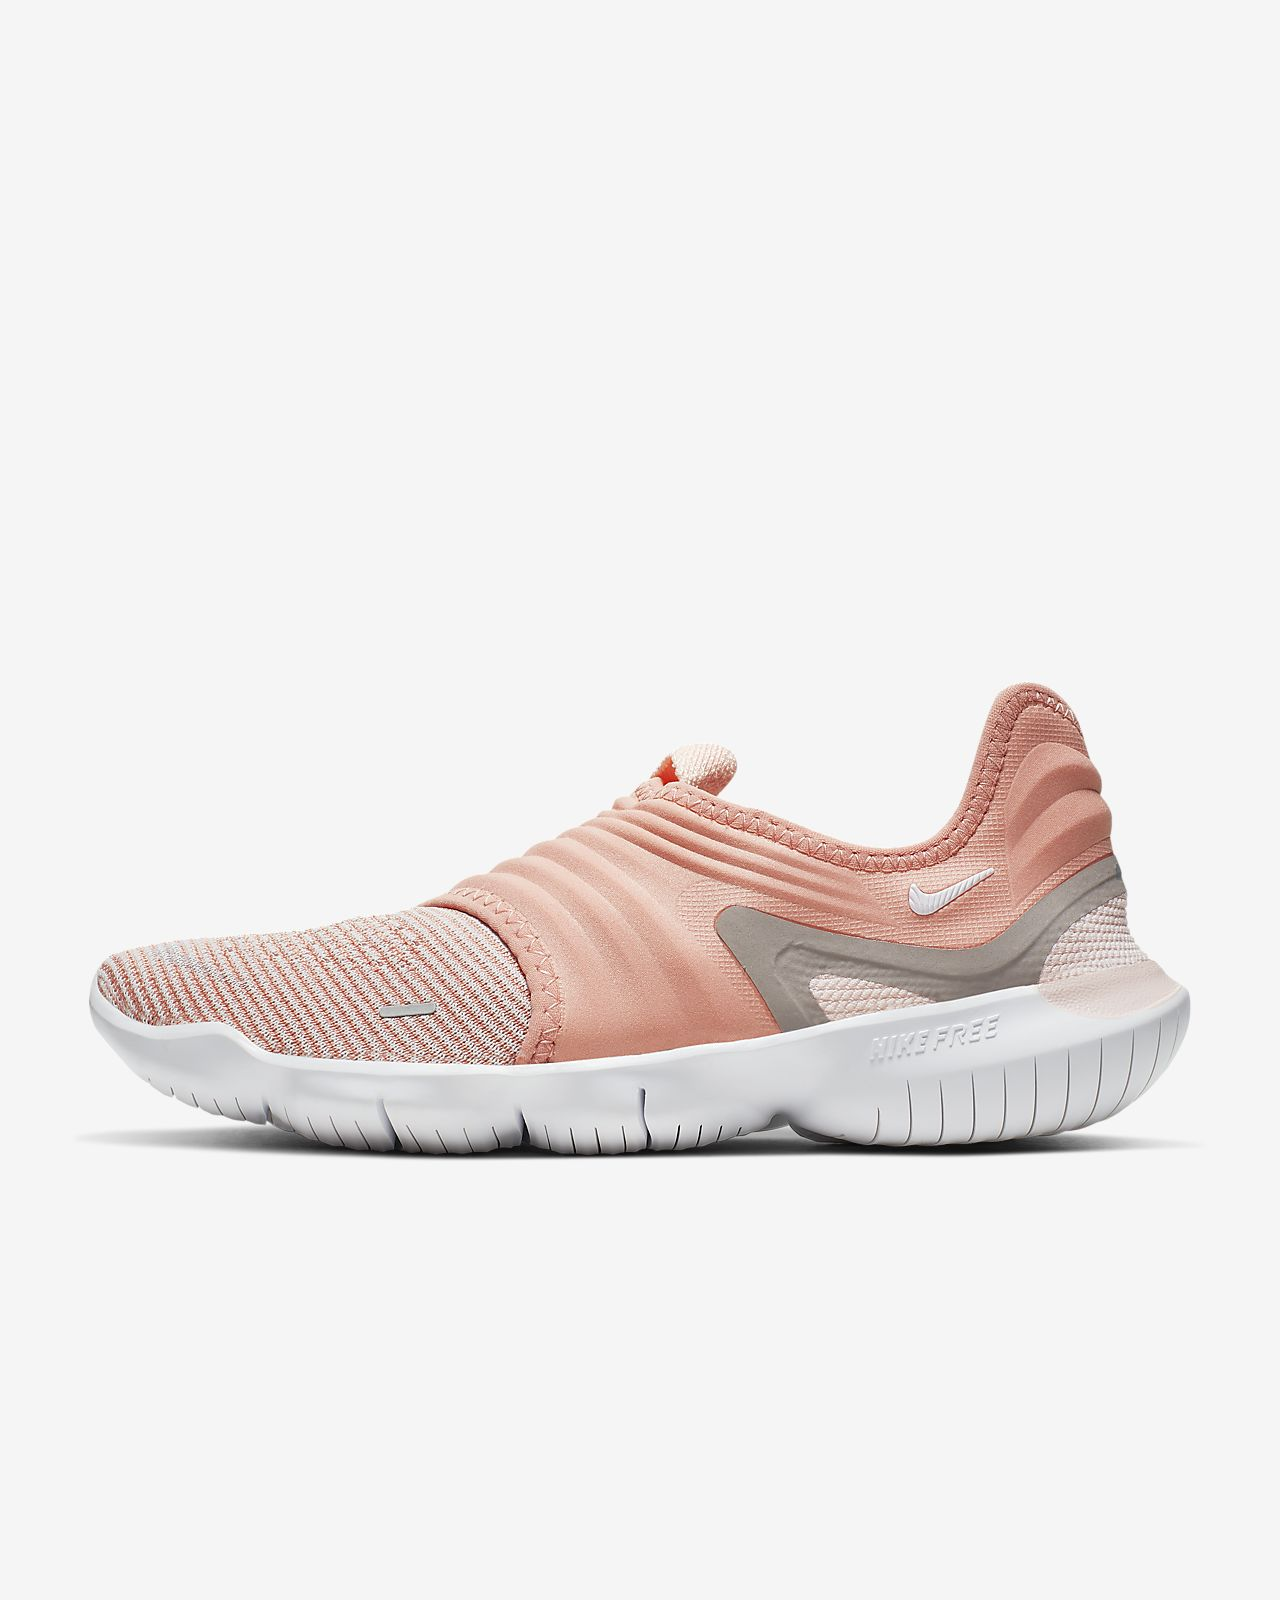 chaussures de séparation e2cba 08e65 Chaussure de running Nike Free RN Flyknit 3.0 pour Femme